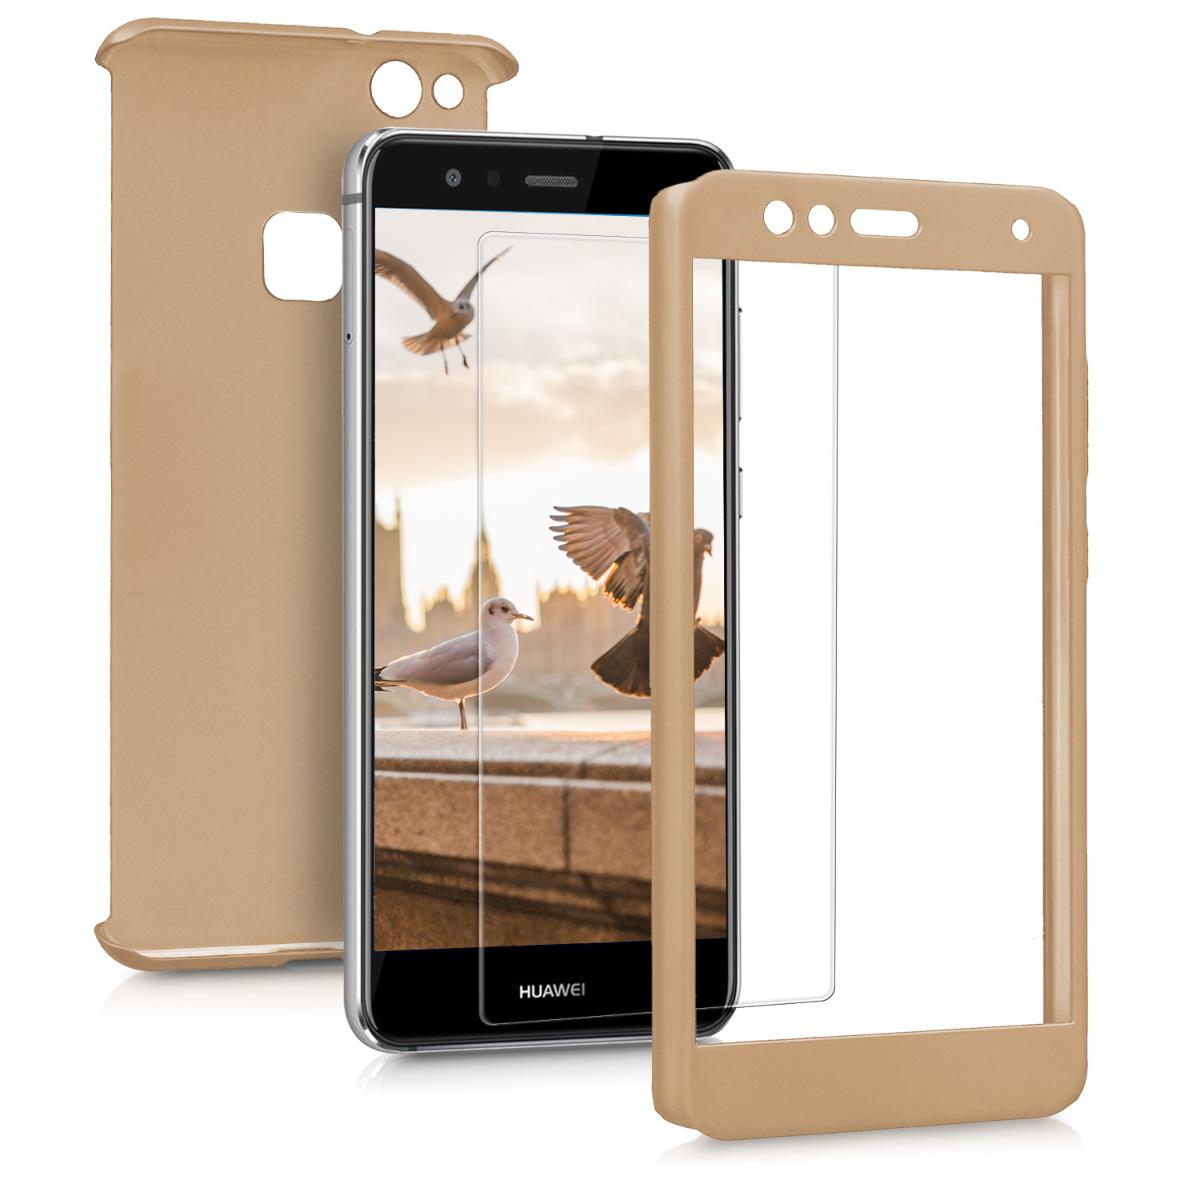 KW Θήκη Full Body Huawei P10 Lite & Tempered Glass - Μεταλλικό χρυσό (43763.66)